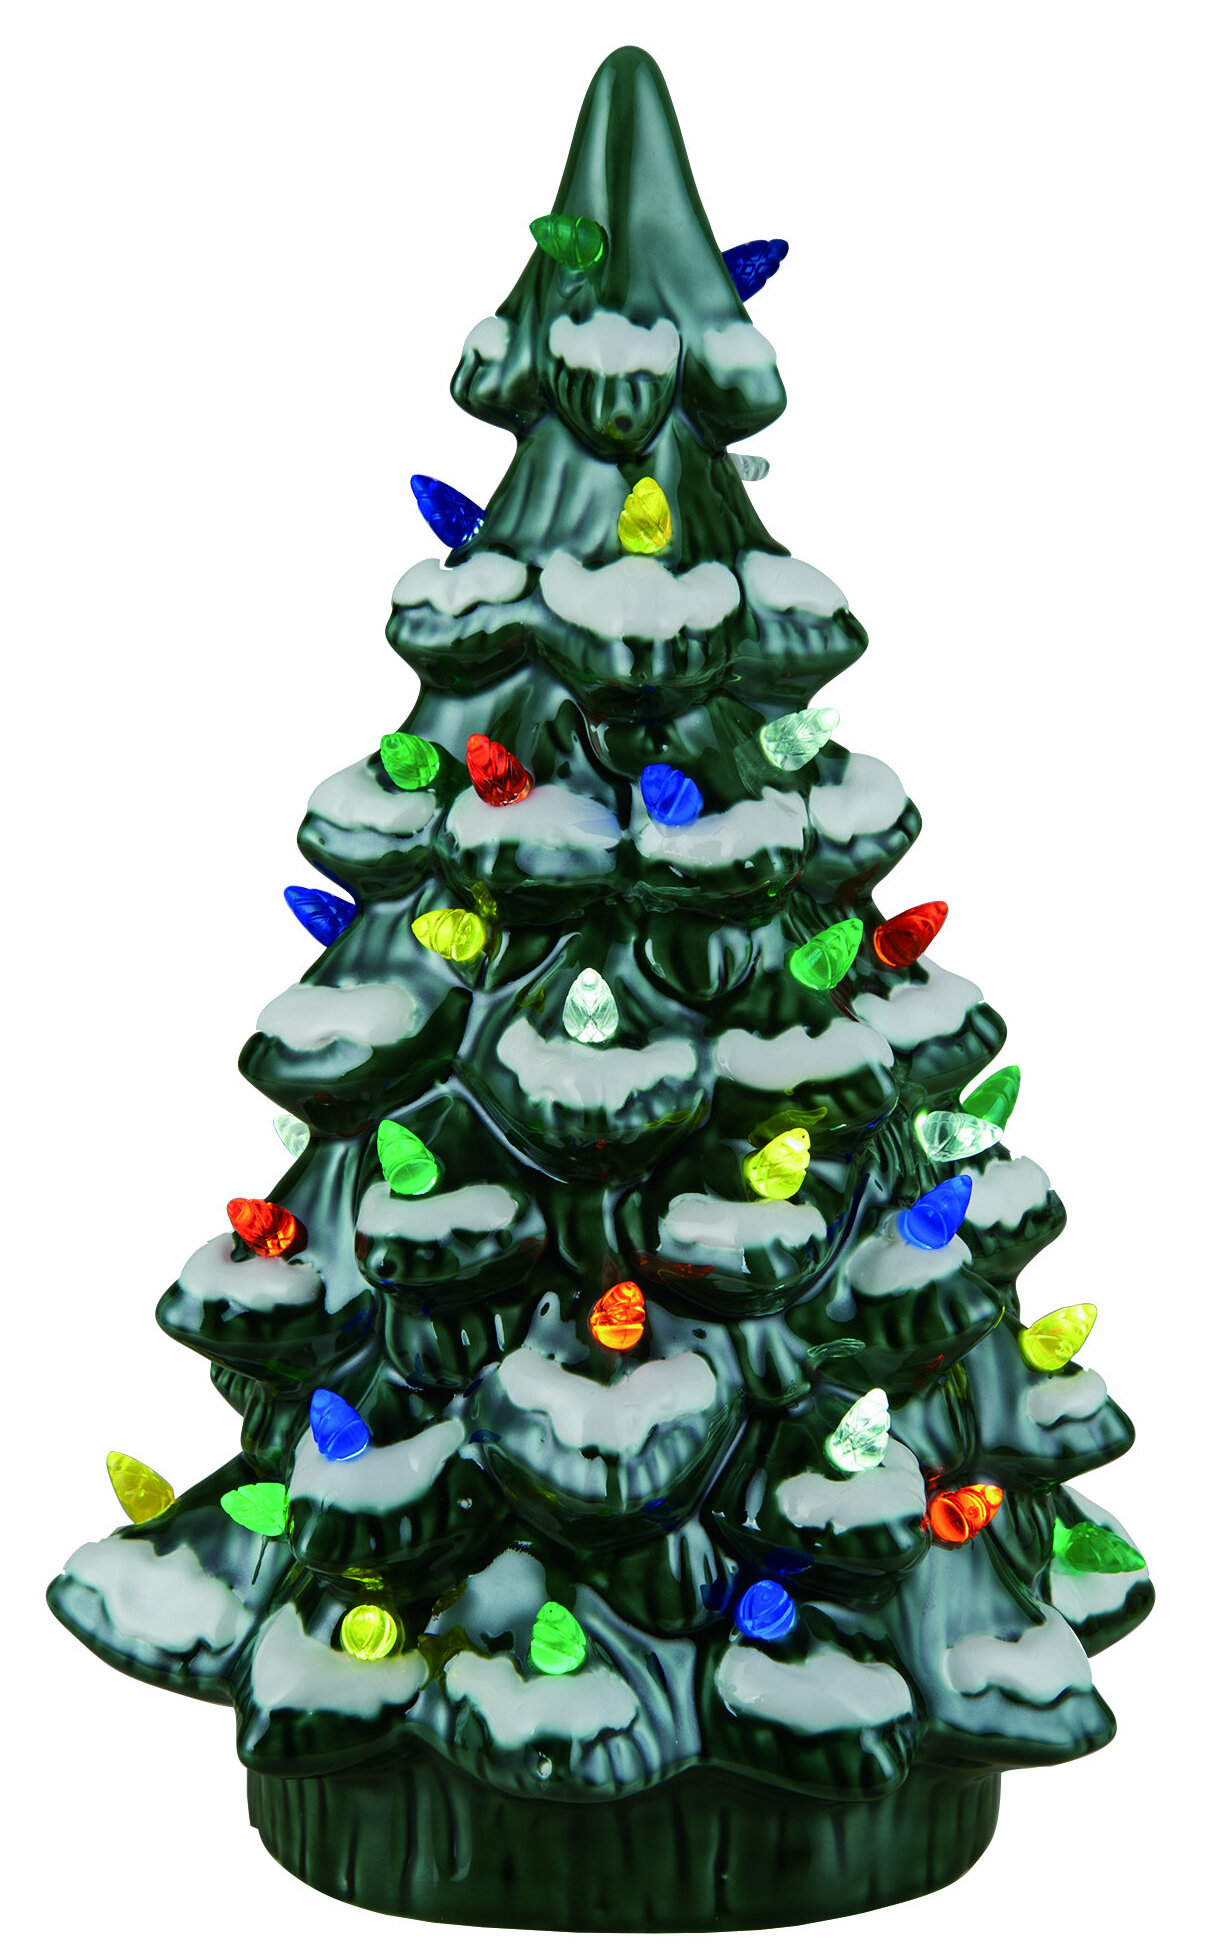 the holiday aisle walter ceramic light up tree decor wayfair - Ceramic Light Up Christmas Tree